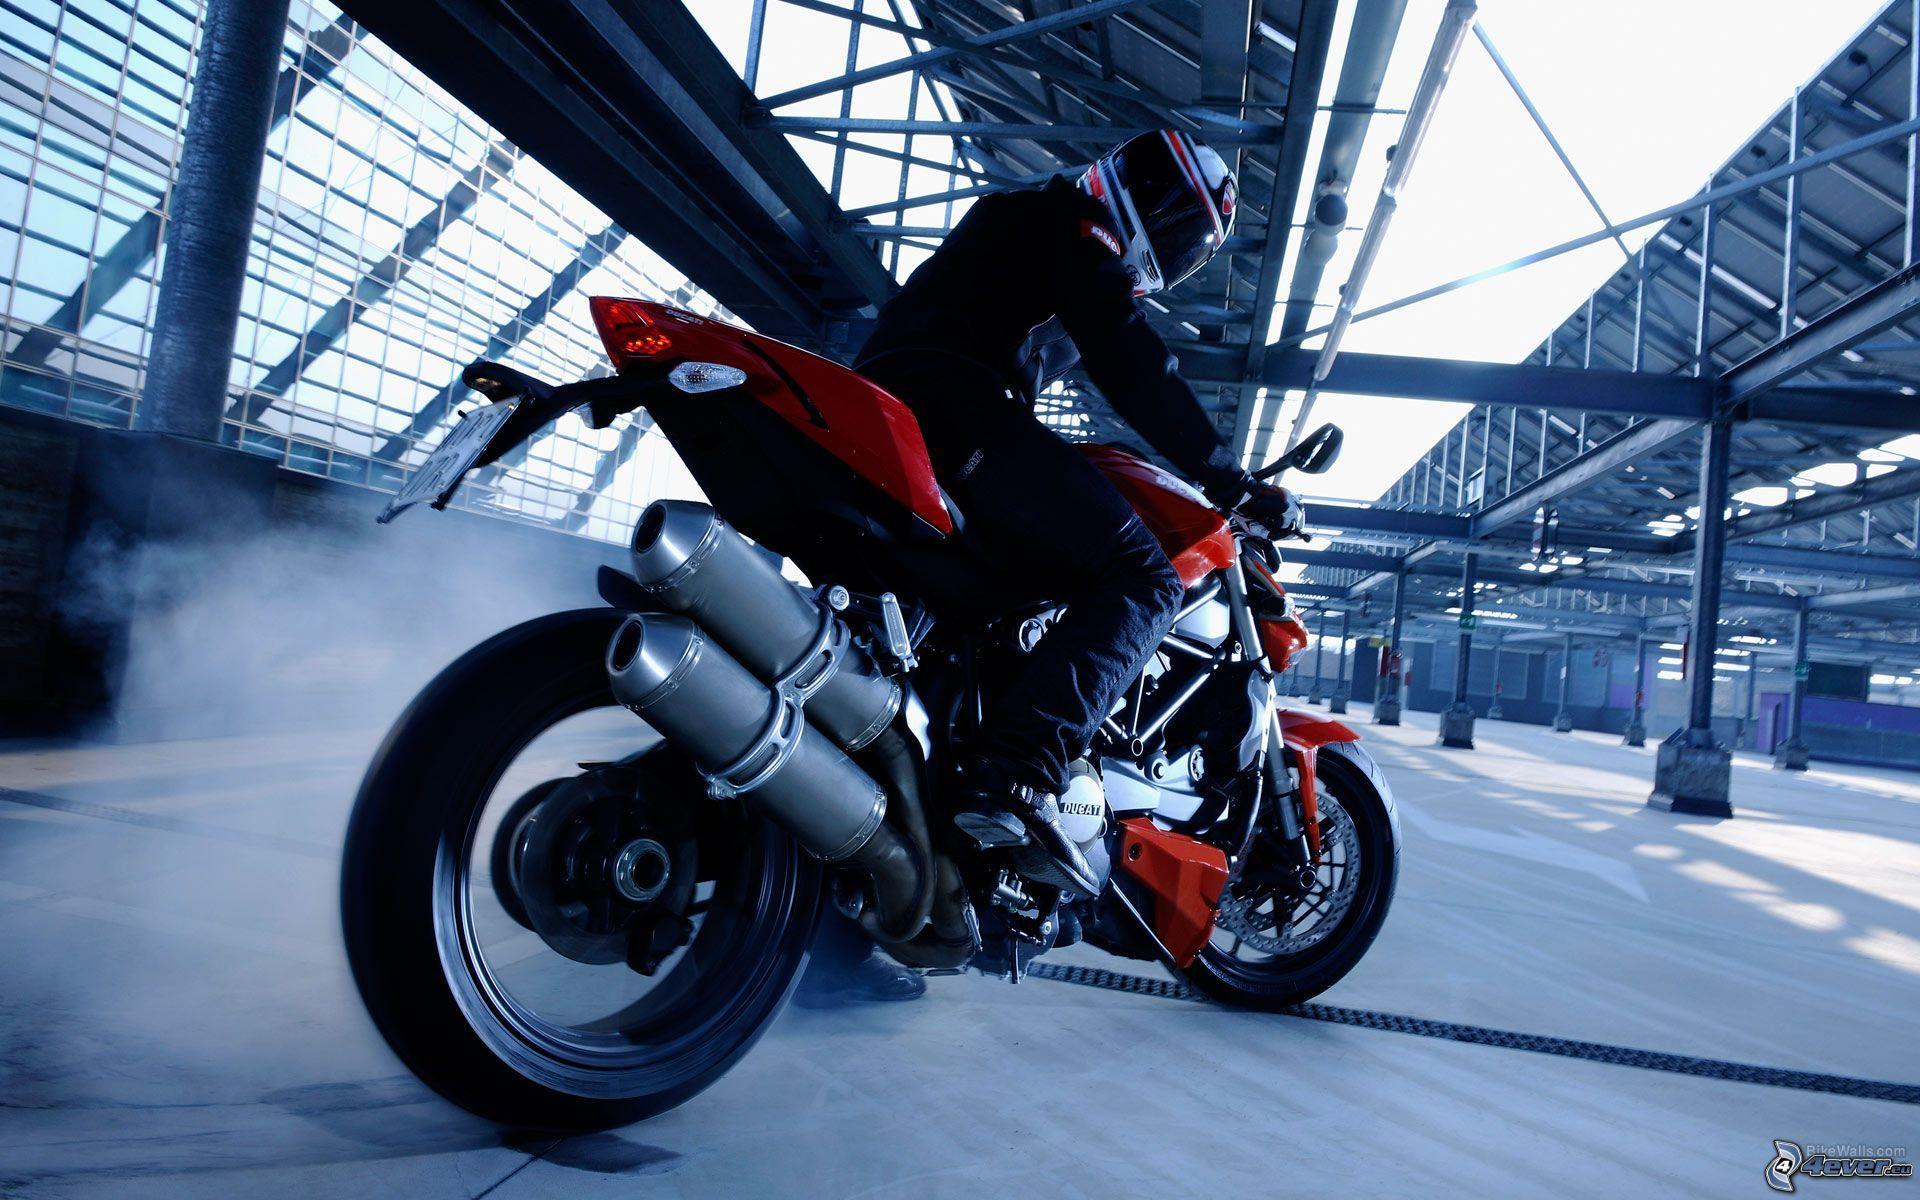 2014-Ducati-Streetfighter-848-Ducati-848.jpg 1920×1200 pixels